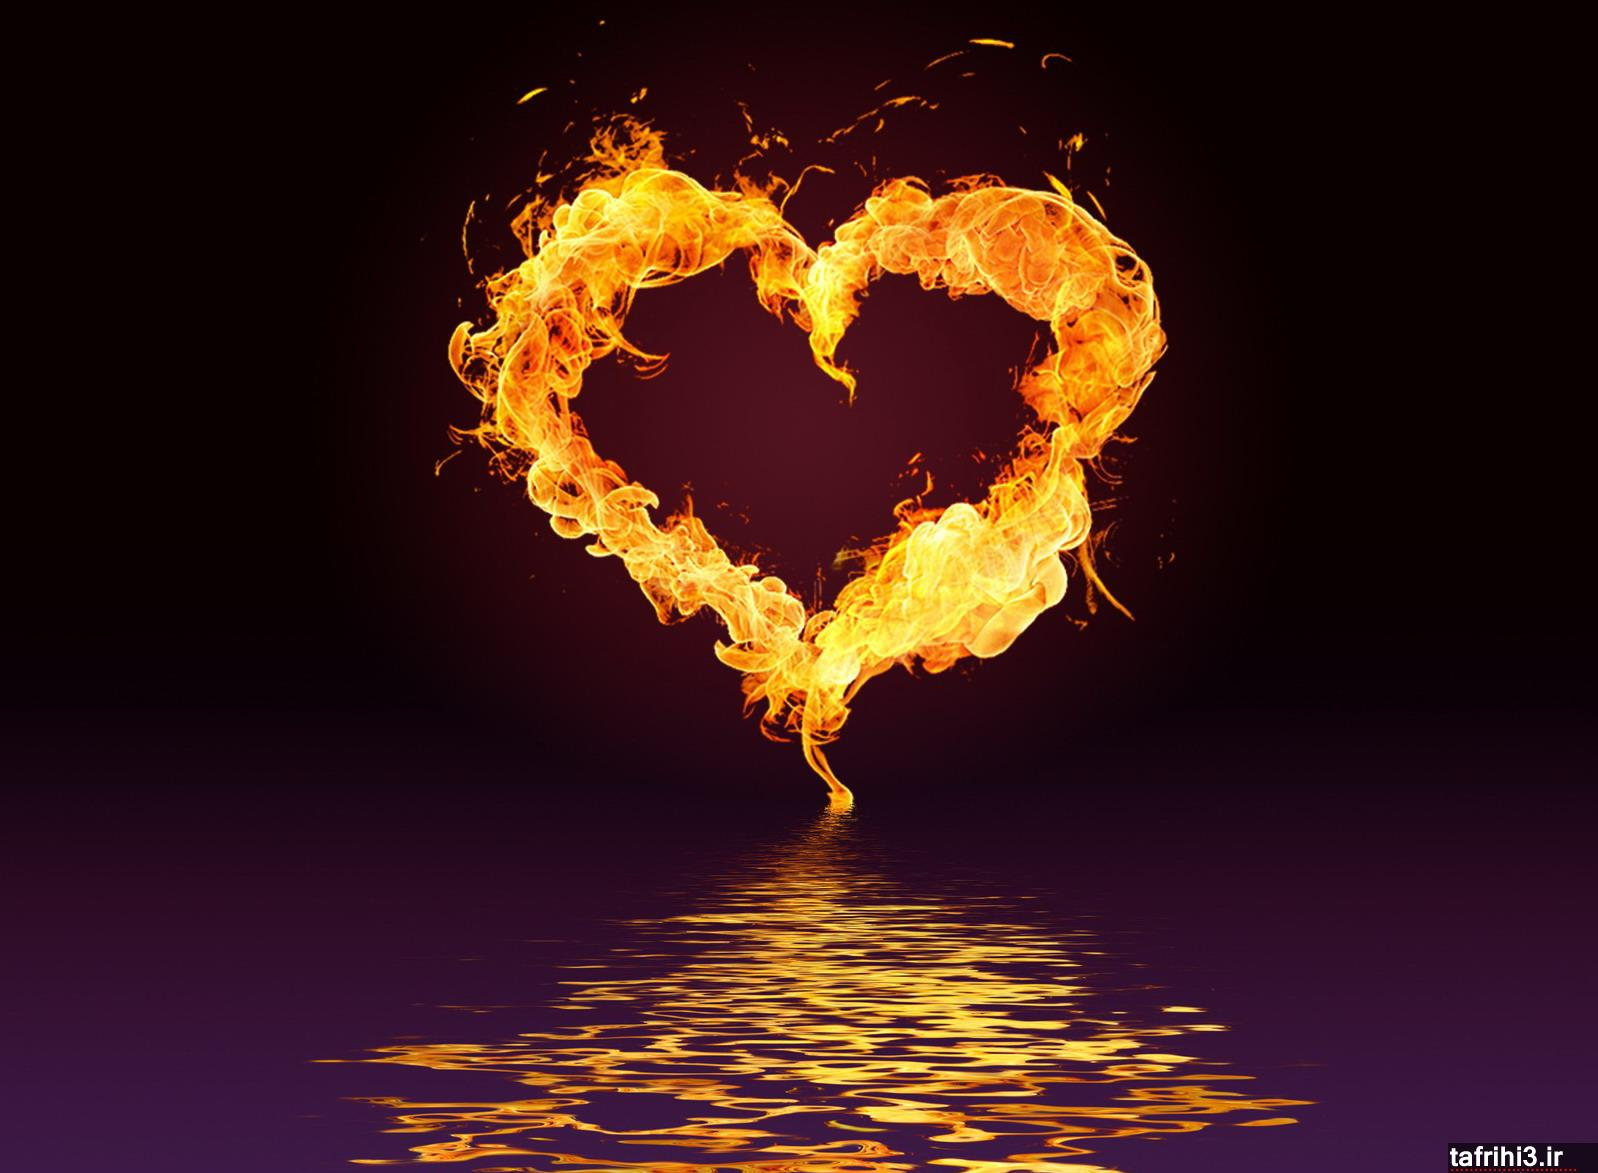 تصاویر عاشقانه رمانتیک قلب